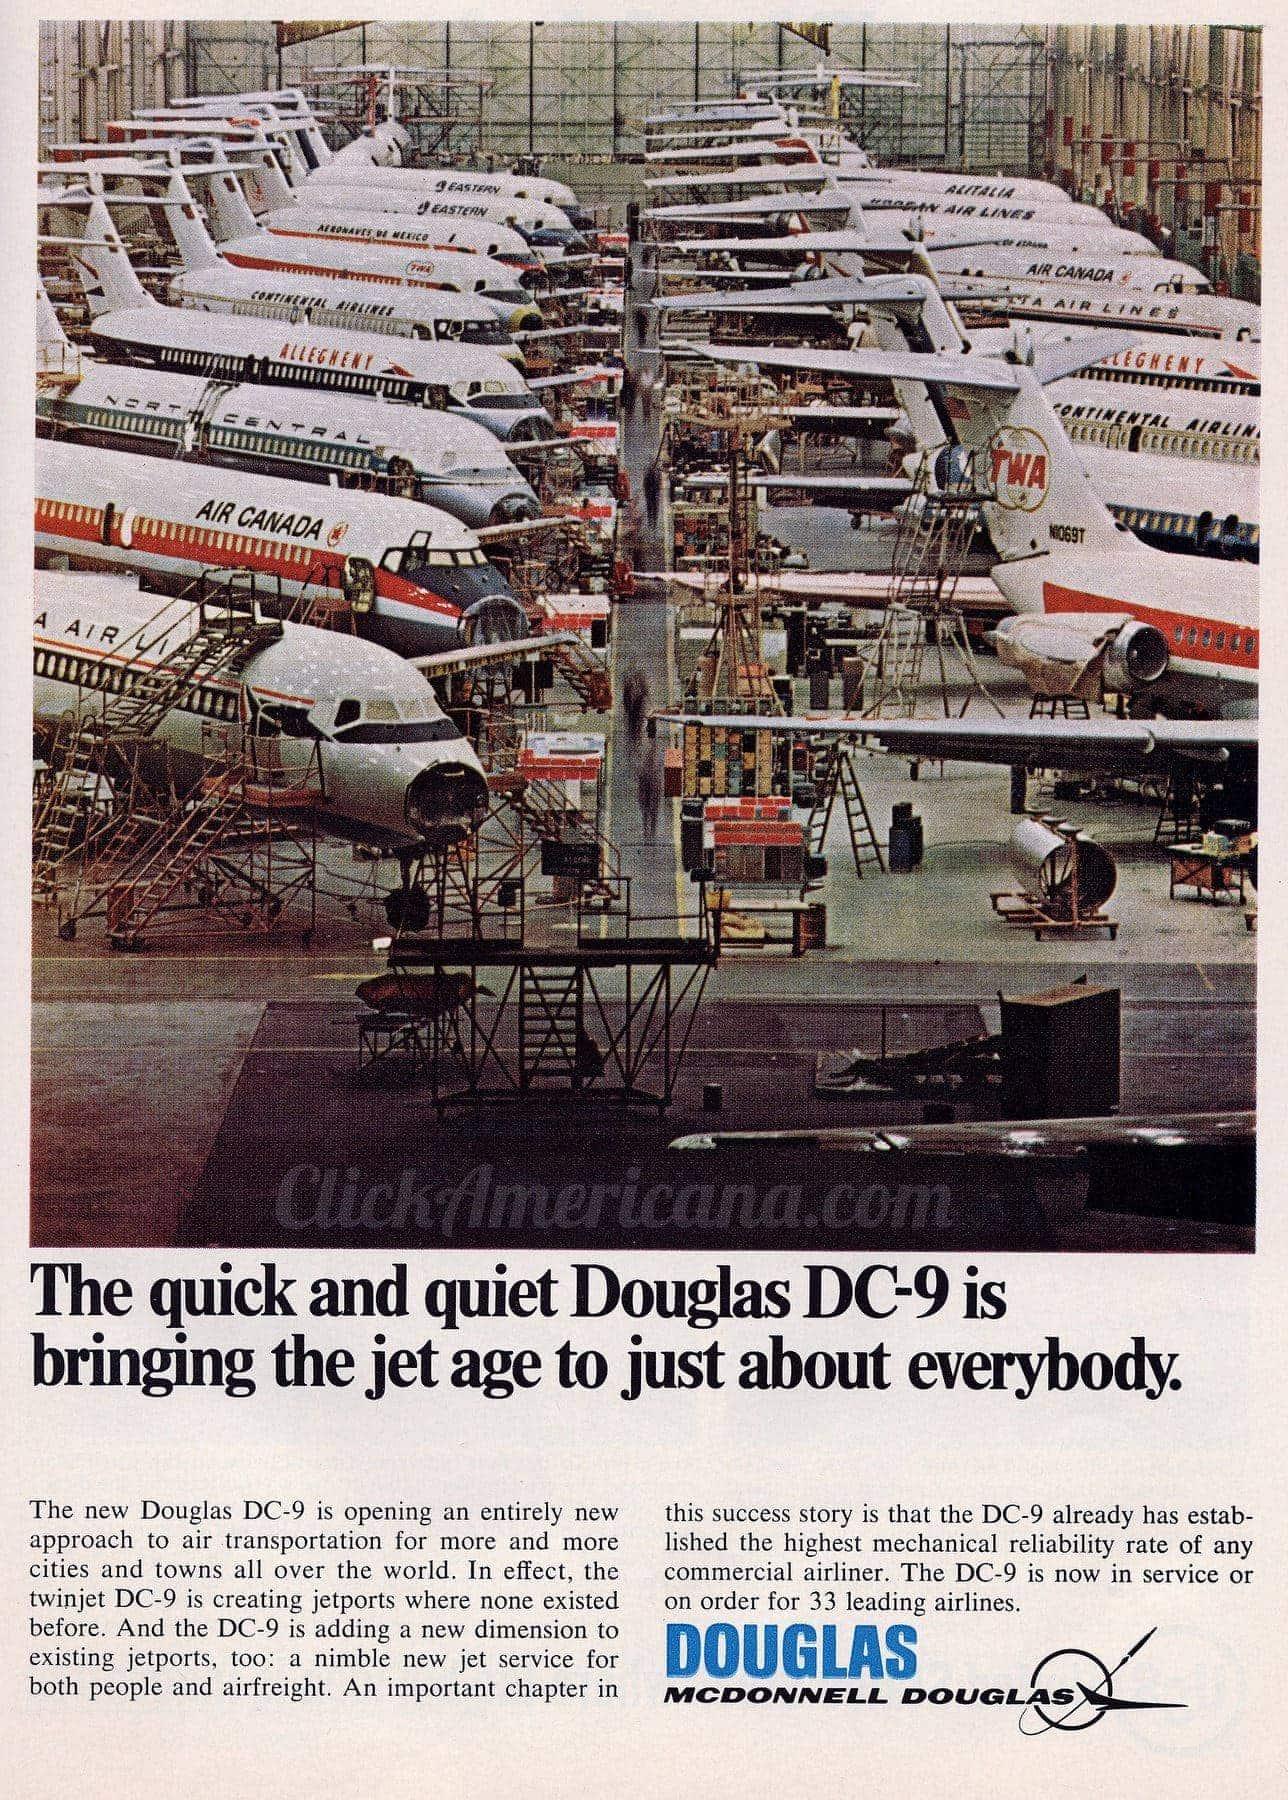 The quick and quiet Douglas DC-9 (1967)